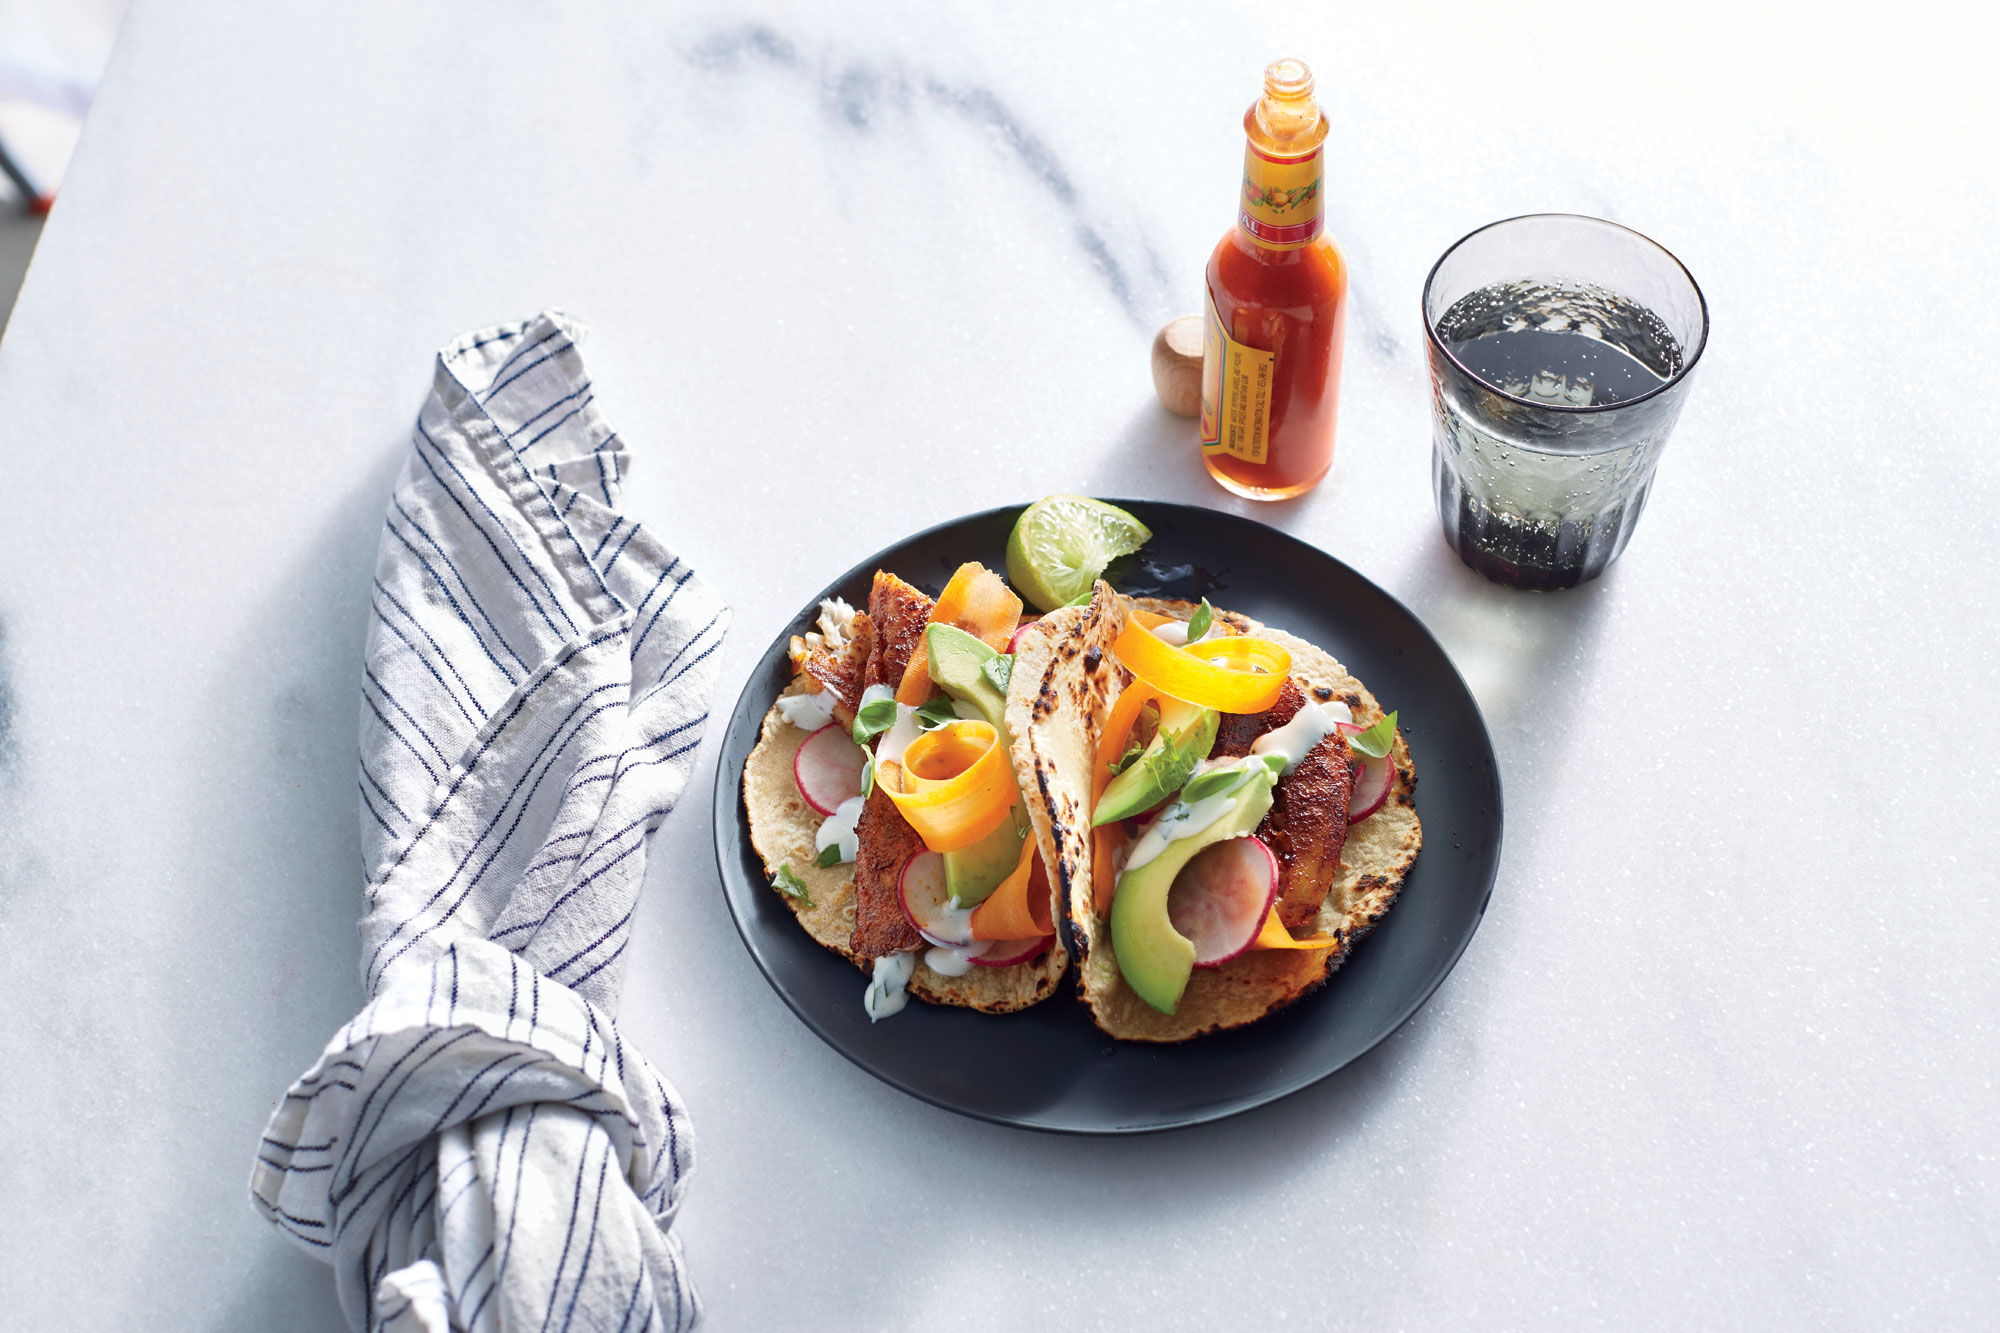 Blackened Tilapia Tacos with Basil-Lime Mayo